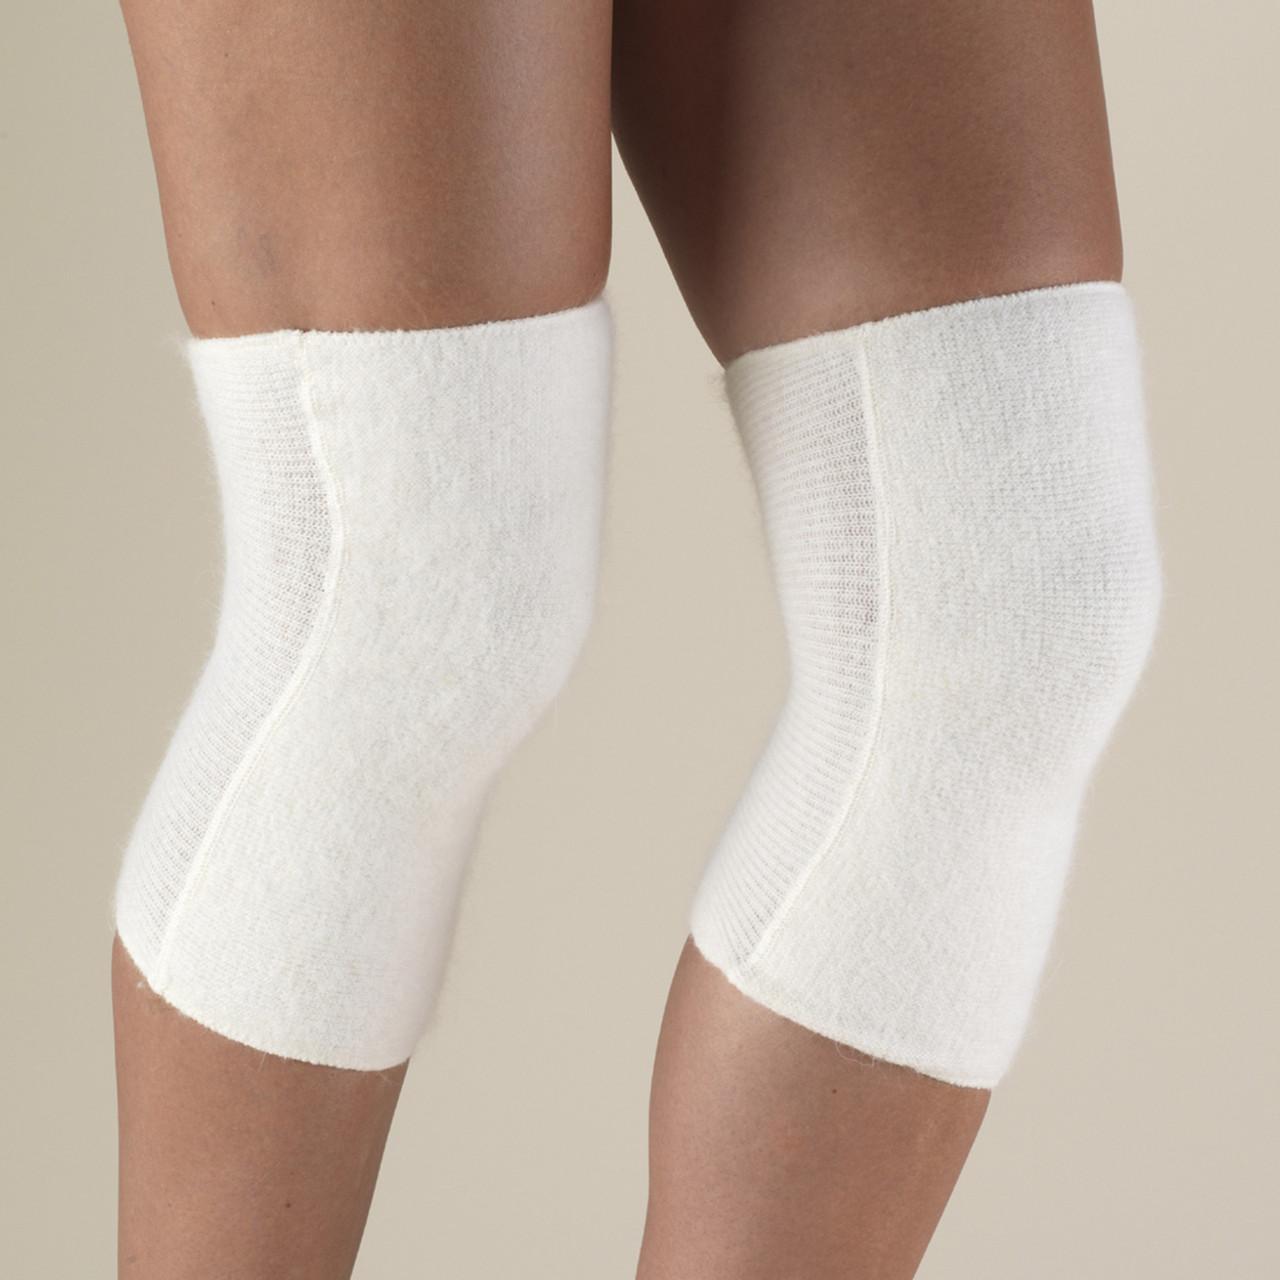 Angora Knee Warmers